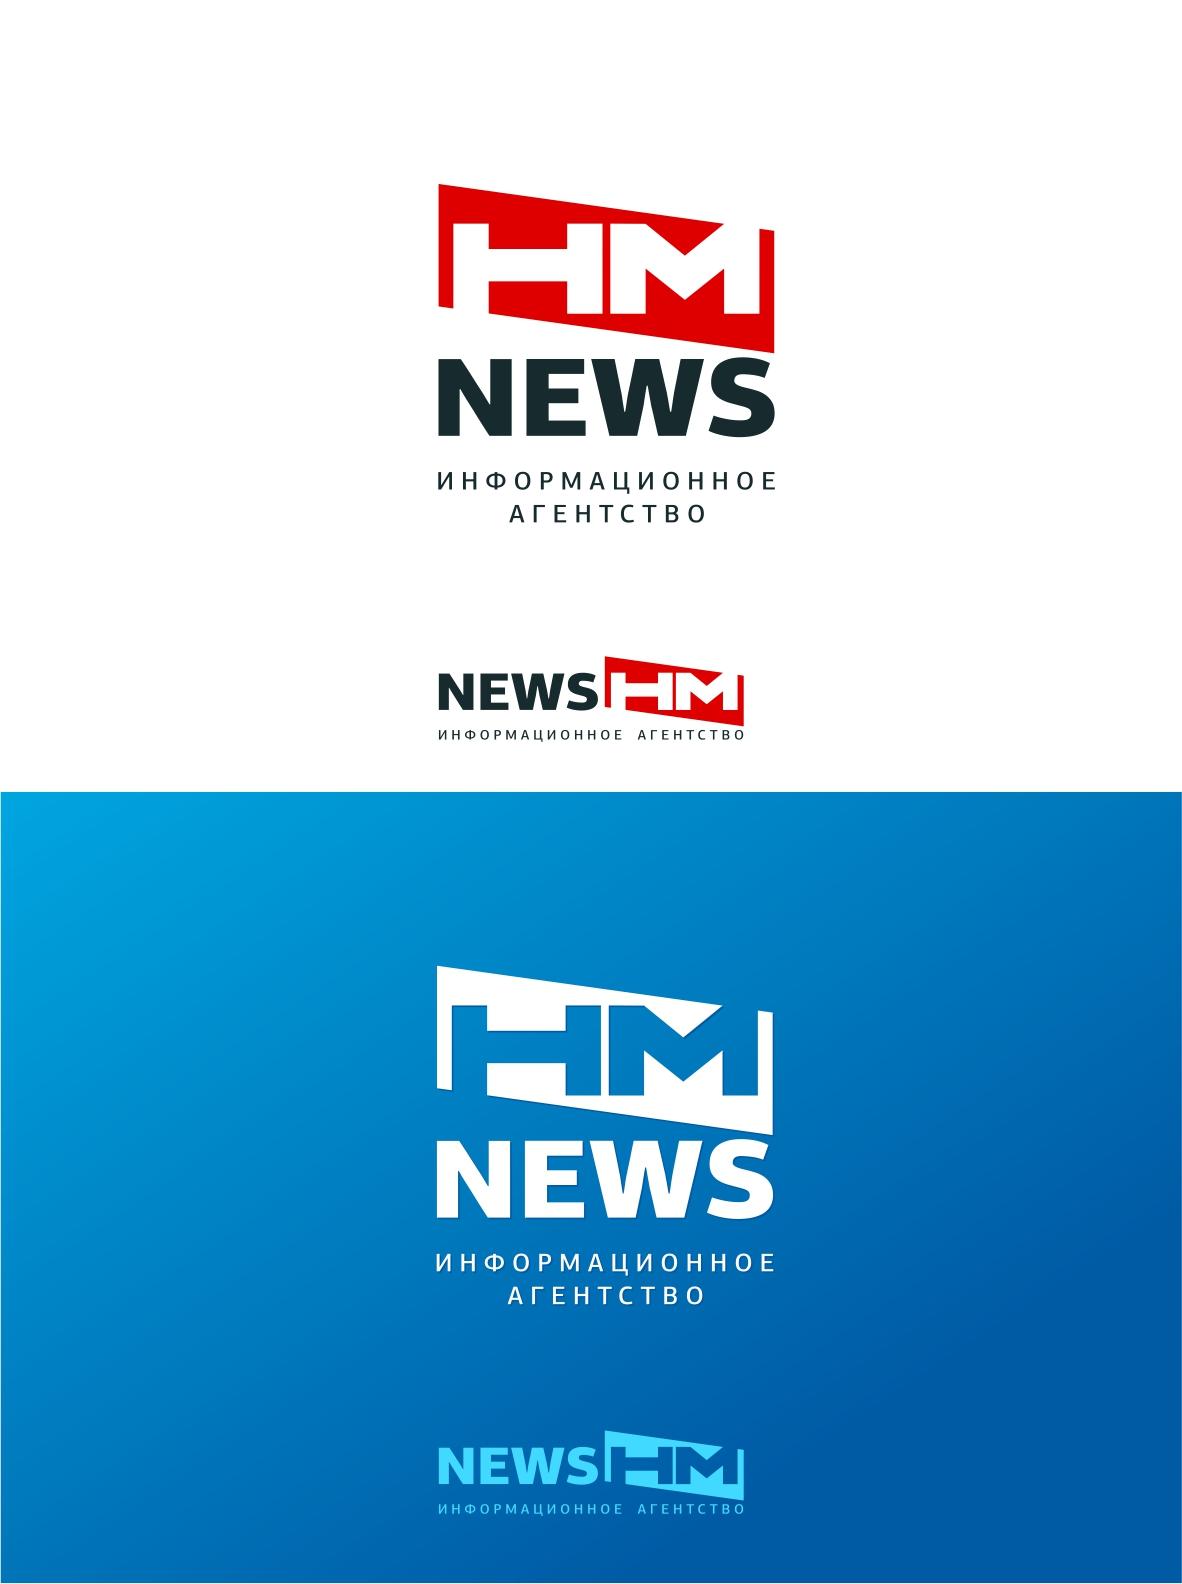 Логотип для информационного агентства фото f_3335aa65857a7954.jpg